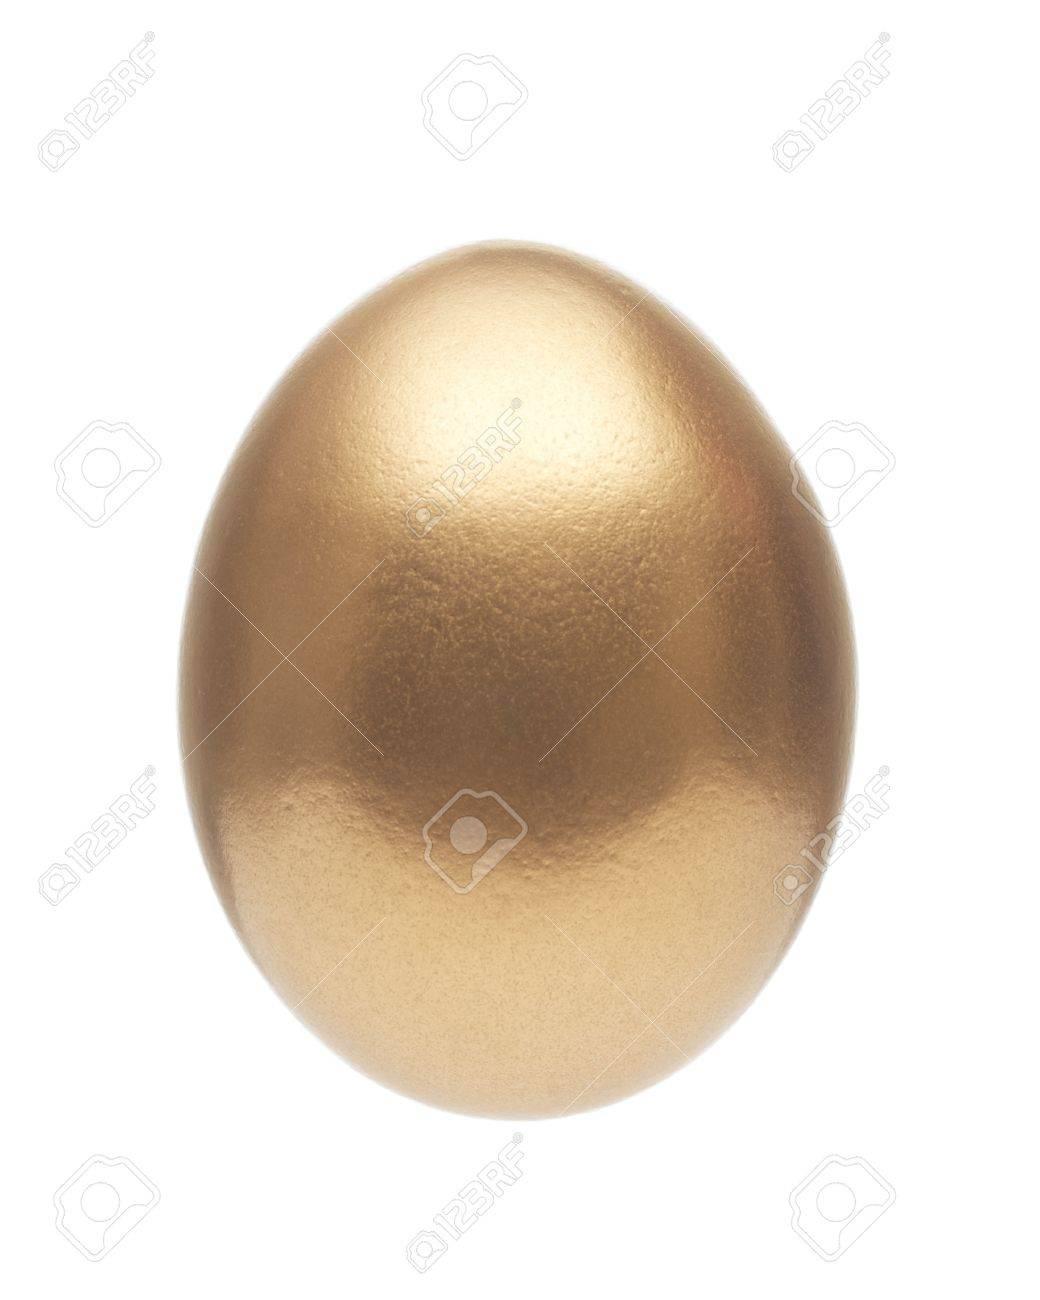 Golden Egg Isolated on White Background Stock Photo - 20910814